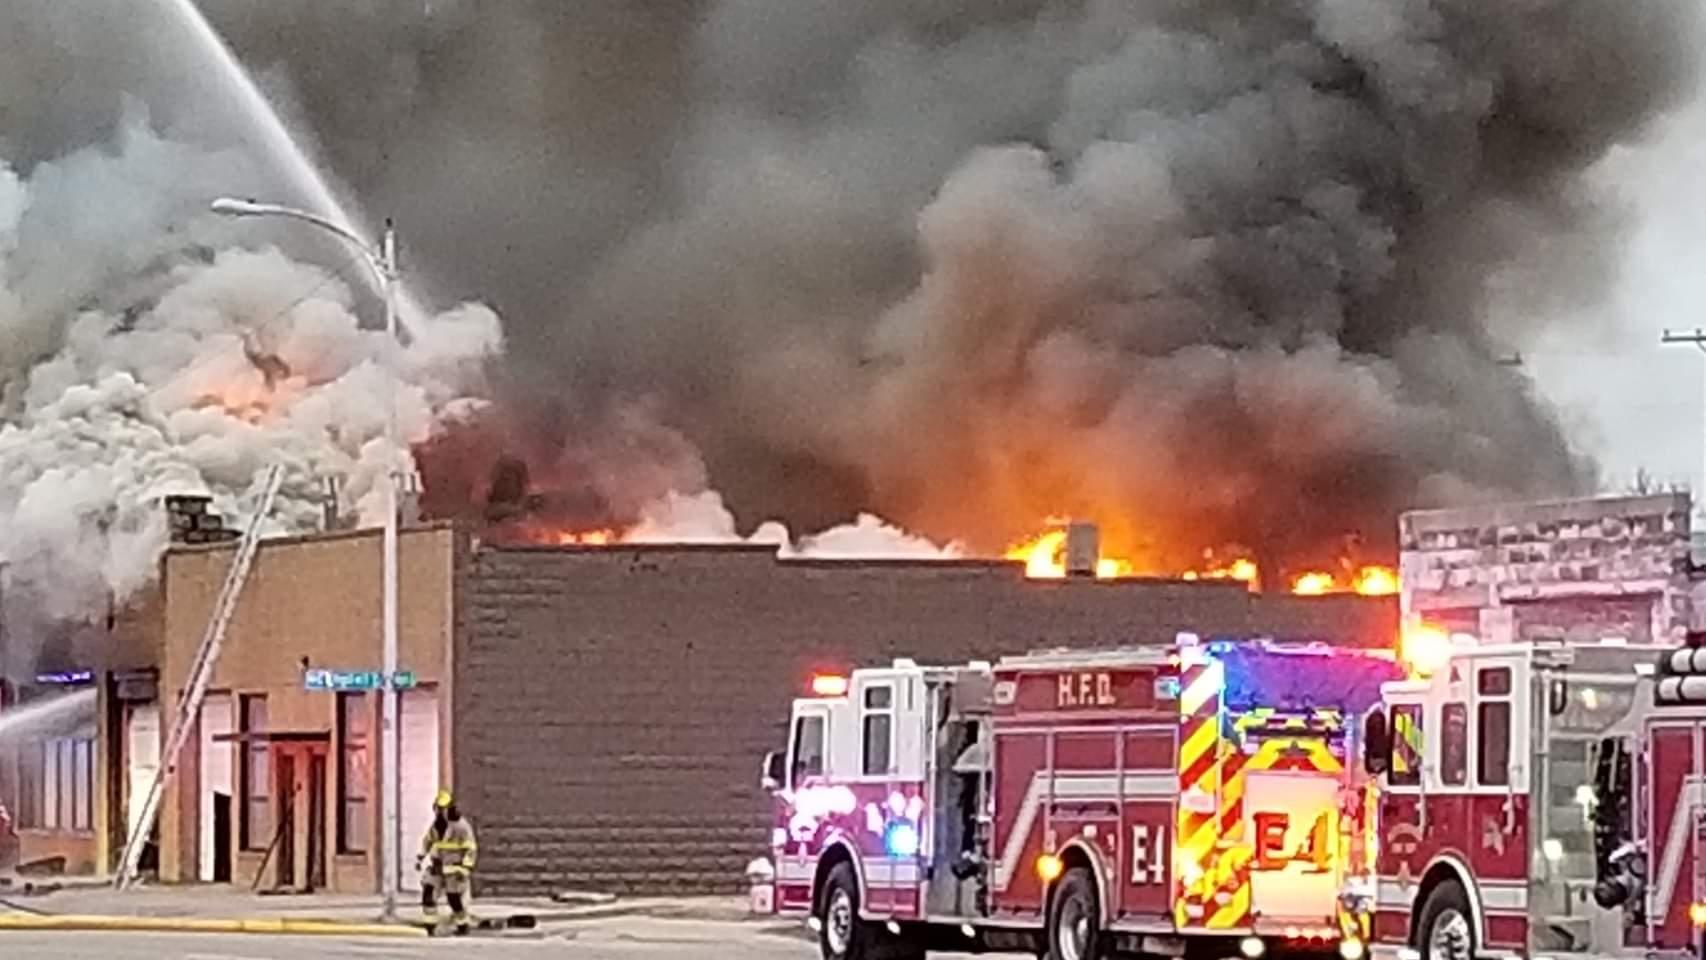 Hutchinson business fire, Courtesy Tim Scott